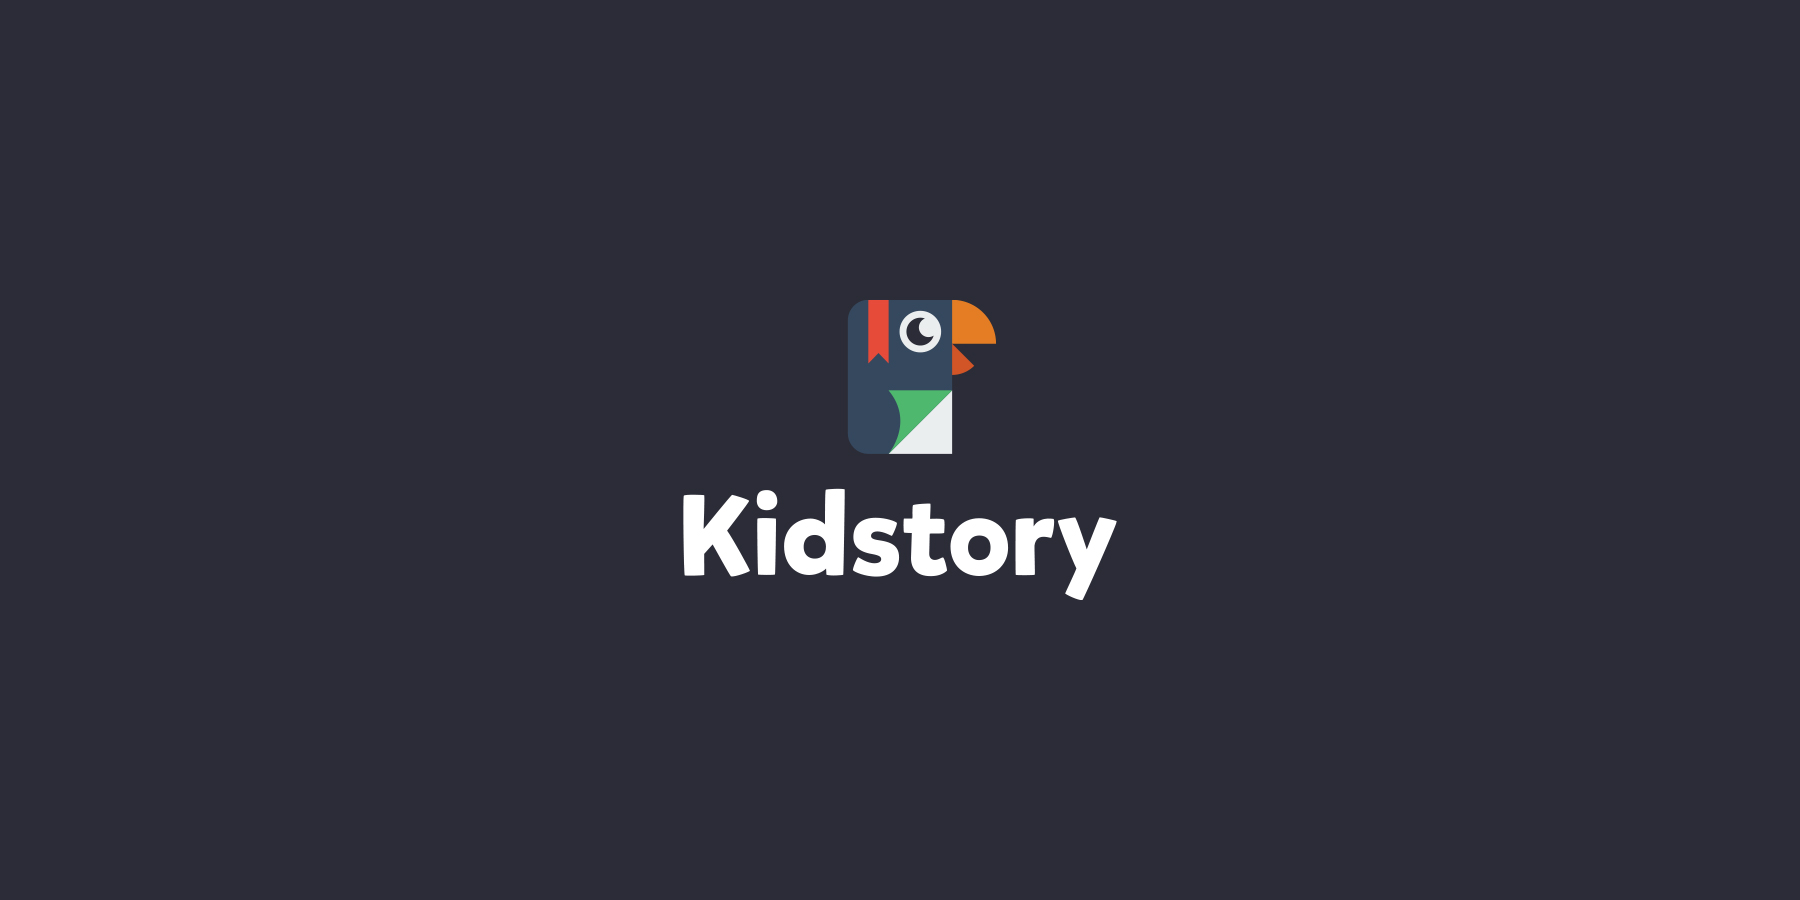 kid-story-logo-design-03